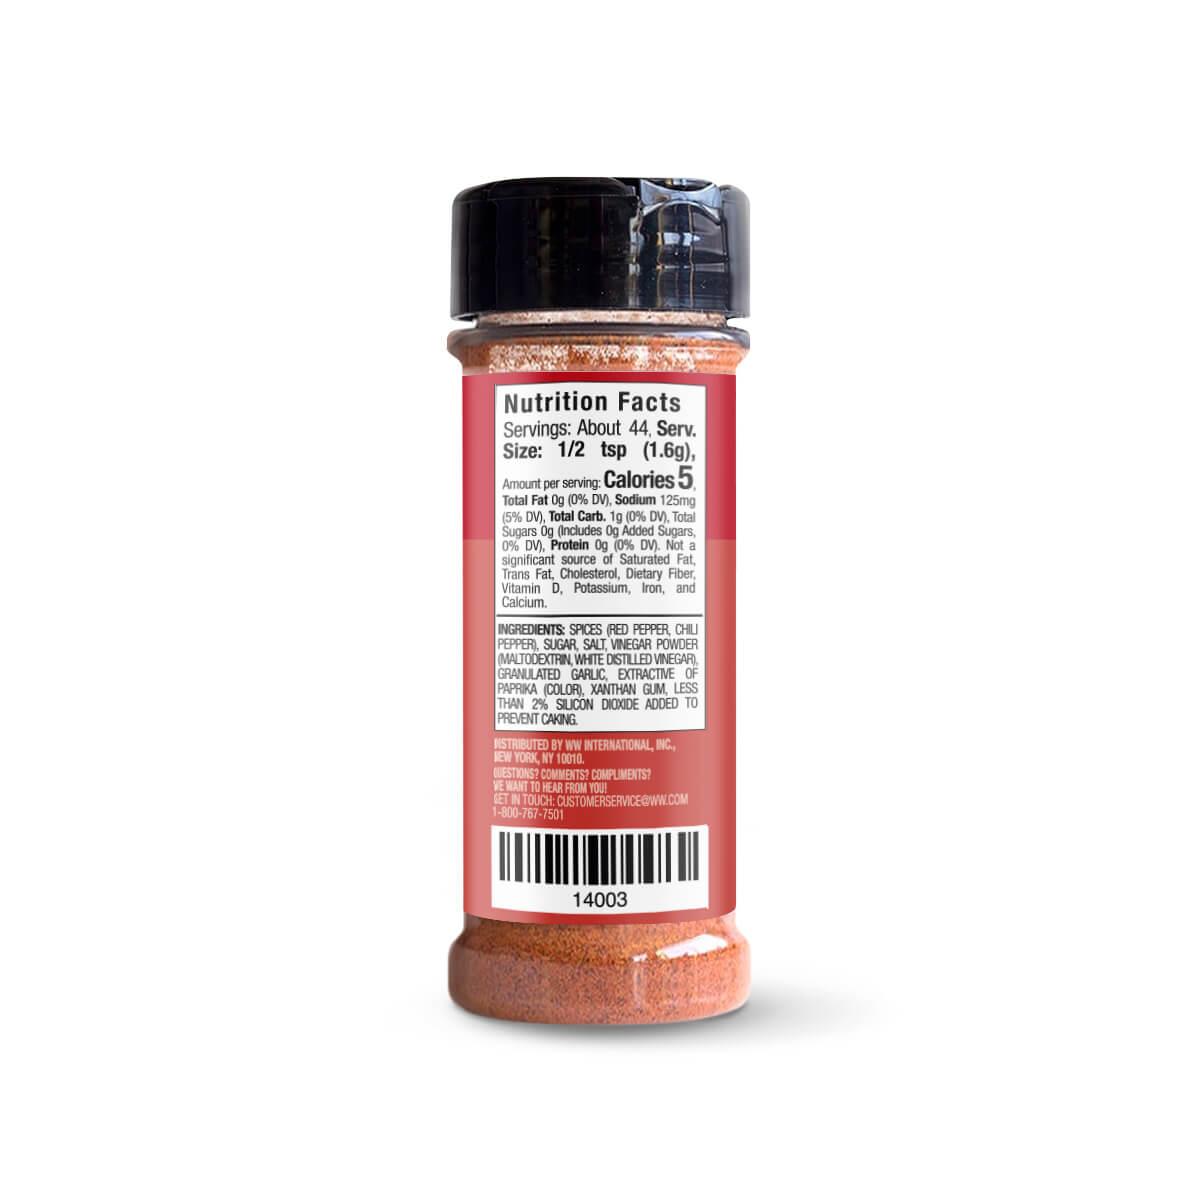 Sizzlin Spicy Sriracha Popcorn Seasoning - back